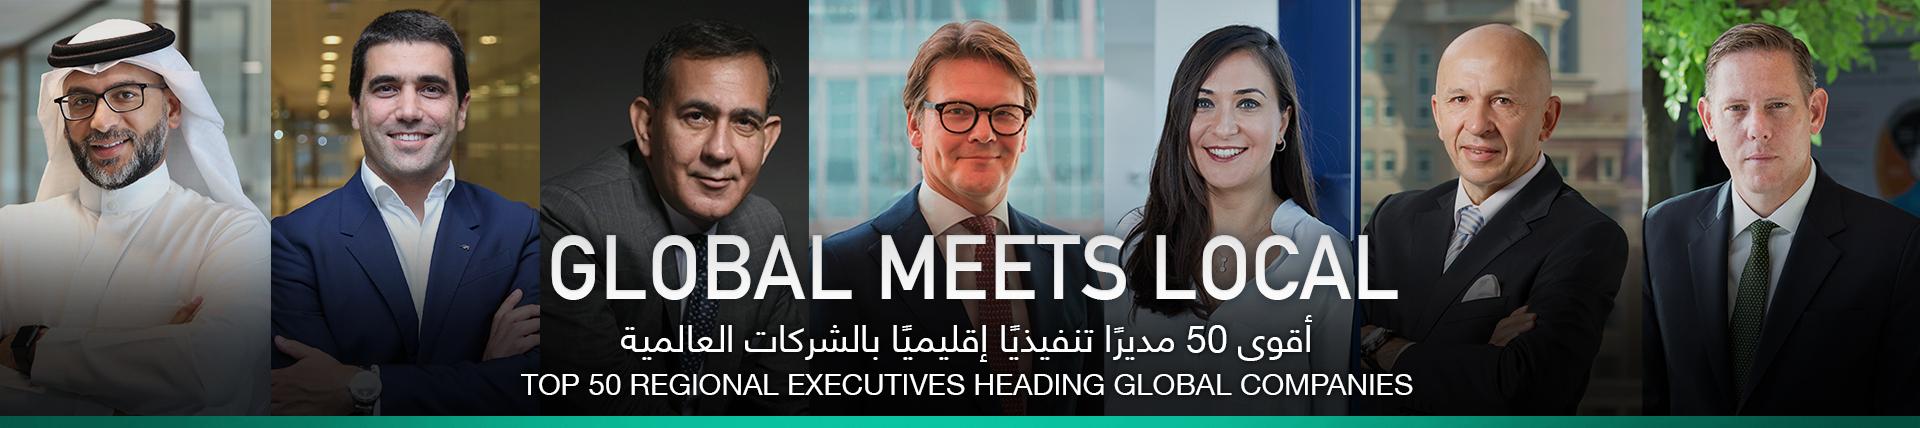 Top 50 Regional Executives Heading Global Companies 2019